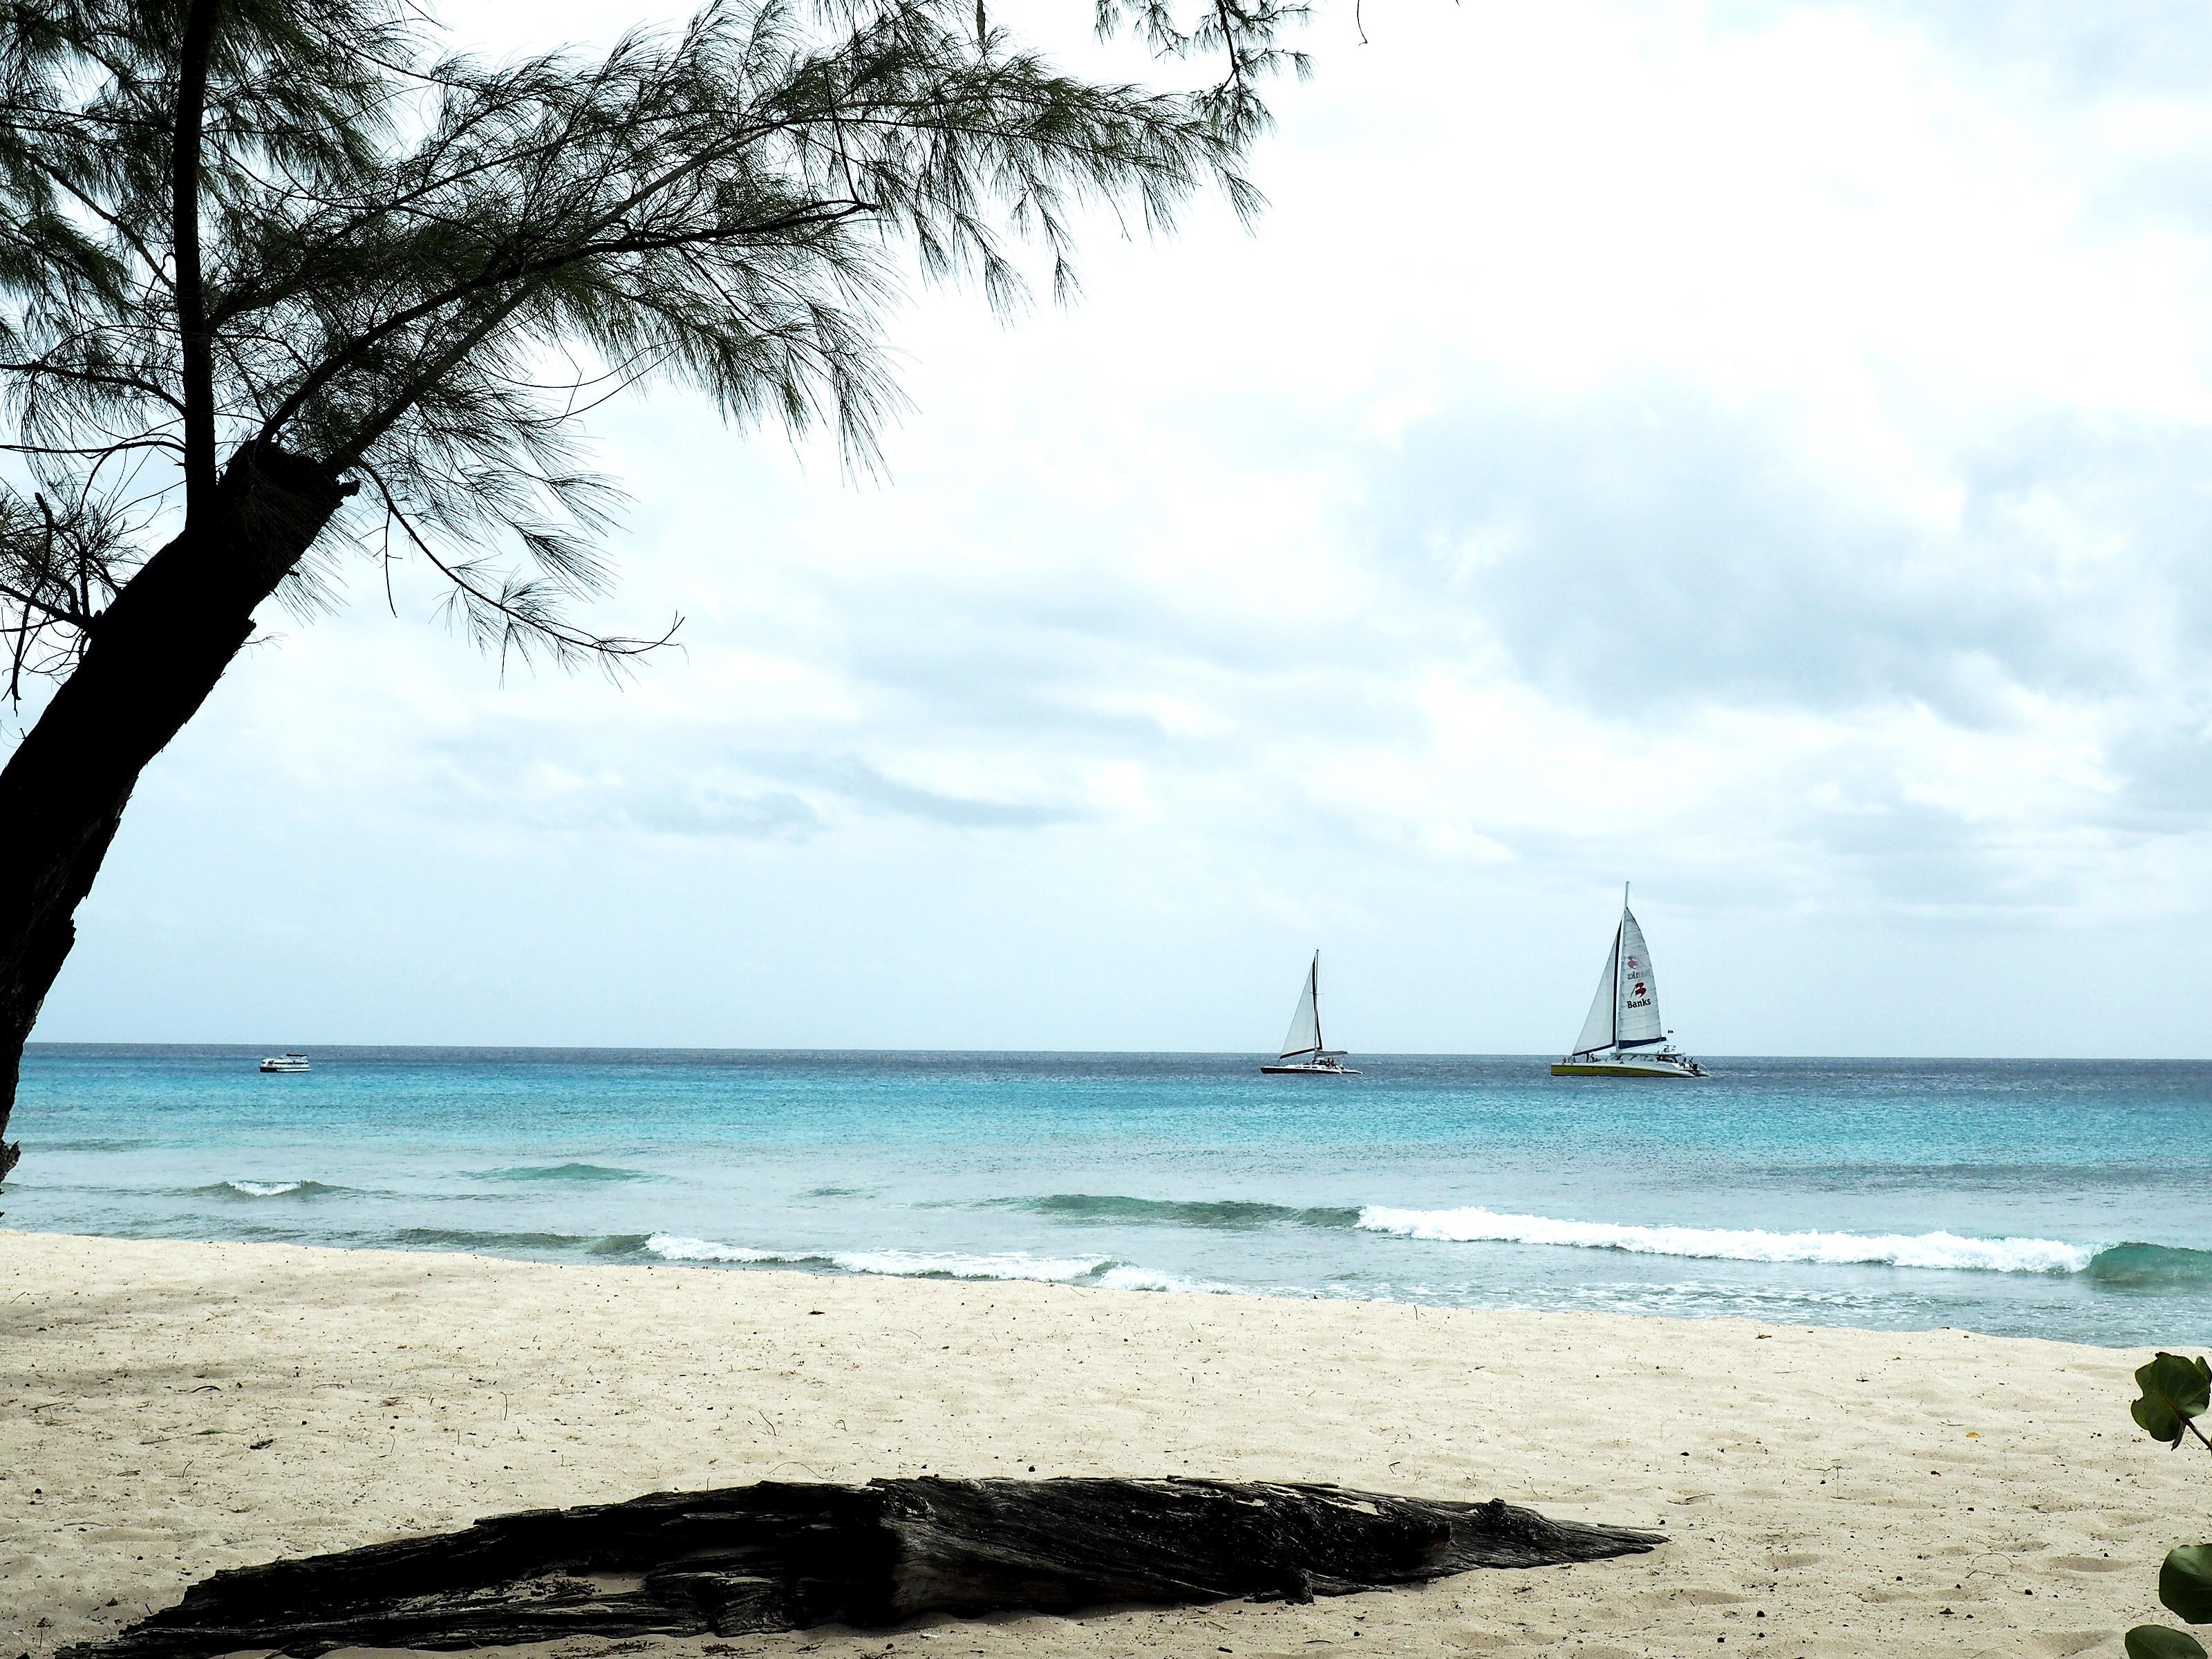 Tommeezjerry-Männerblog-Berlinblog-Fashionblog-Styleblog-Travelblog-Travel-Reiseblog-Reisen-Barbados-Karibik-Carribean-Summer-Sommer-Vacation-11